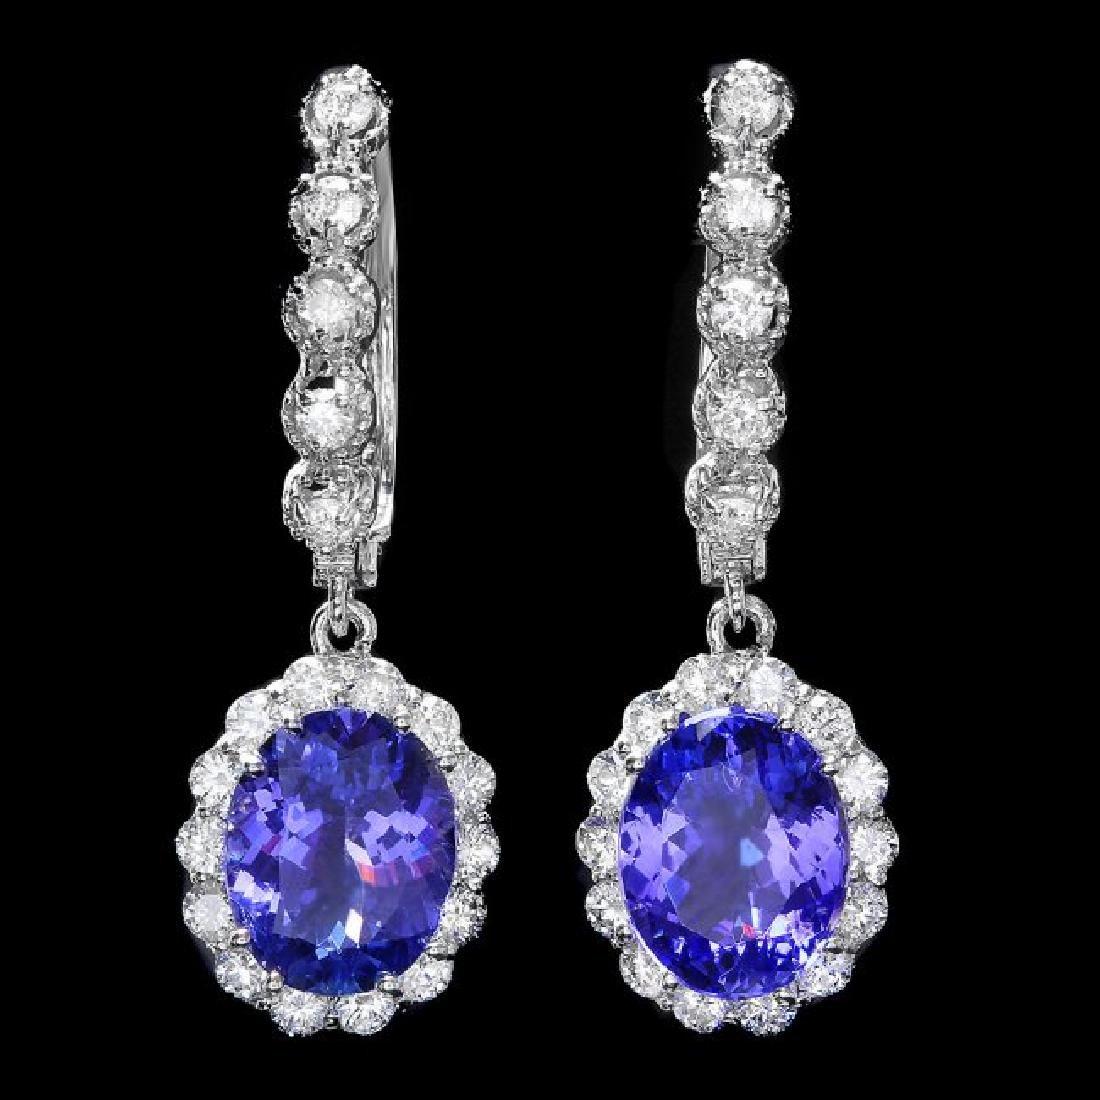 14k Gold 5ct Tanzanite 1.35ct Diamond Earrings